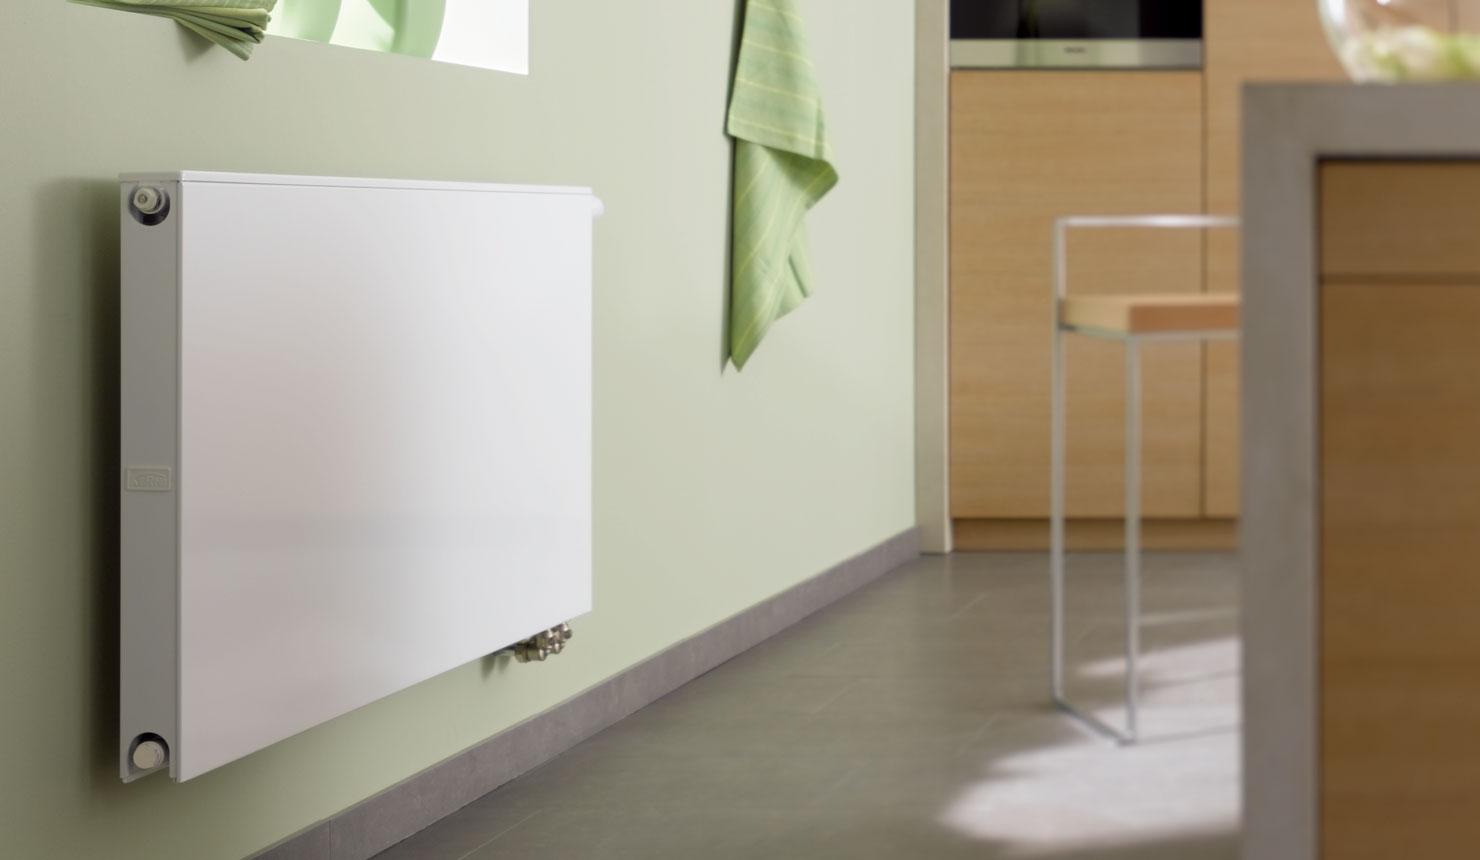 Full Size of Heizkörper Flach Therm X2 Planheizkrper Flachheizkrper Kermi Für Bad Bett Elektroheizkörper Badezimmer Flachdach Fenster Wohnzimmer Wohnzimmer Heizkörper Flach